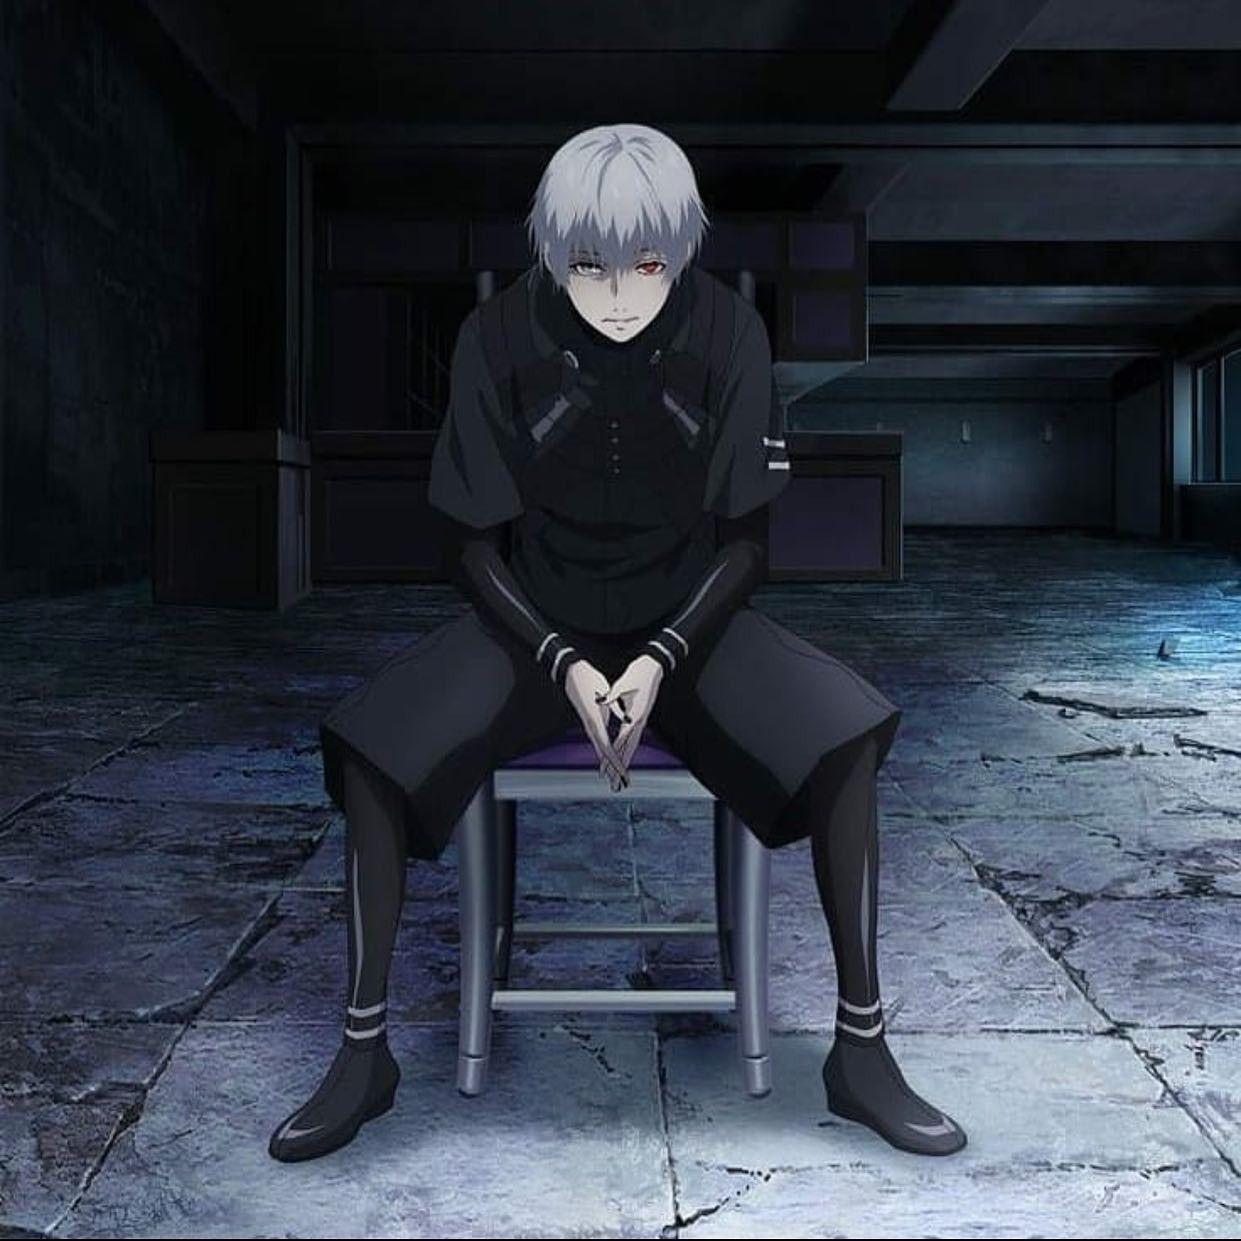 Tokyo Ghoul Season 4 Google Drive Gdrive English Dubbed 720p Tokyo Ghoul Tokyo Ghoul Season 1 Tokyo Ghoul Episodes